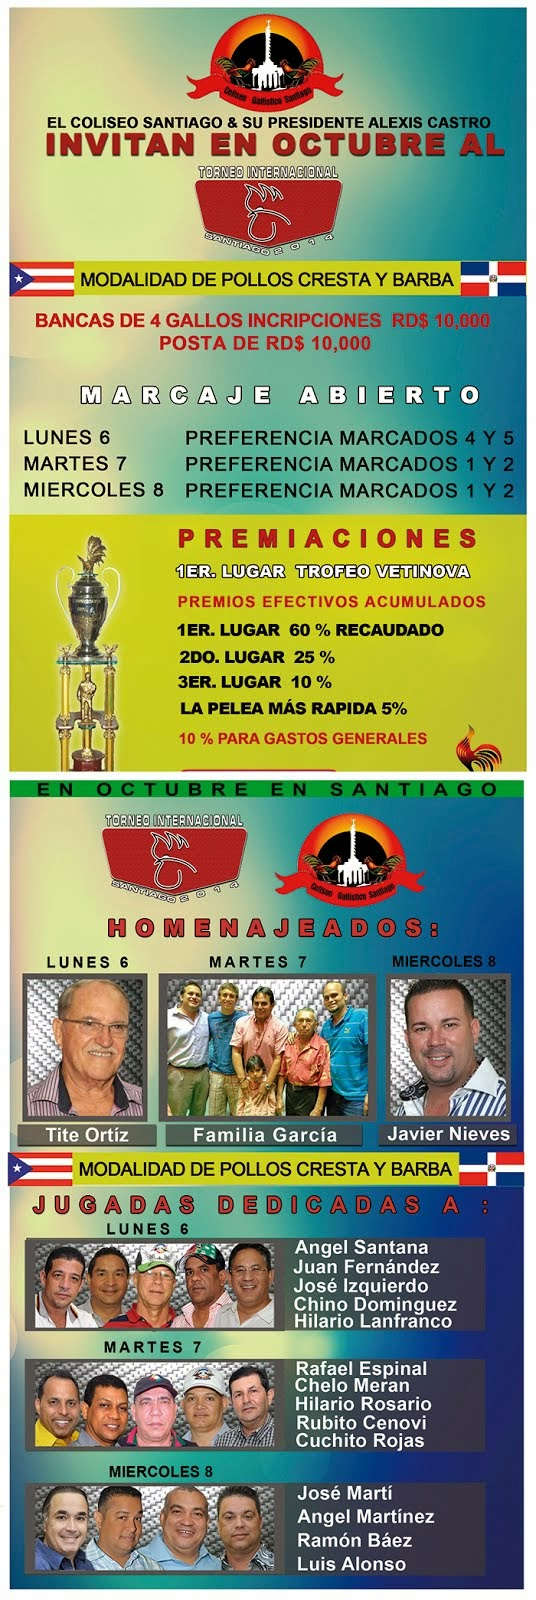 TORNEO INTERNACIONAL SANTIAGO 2014